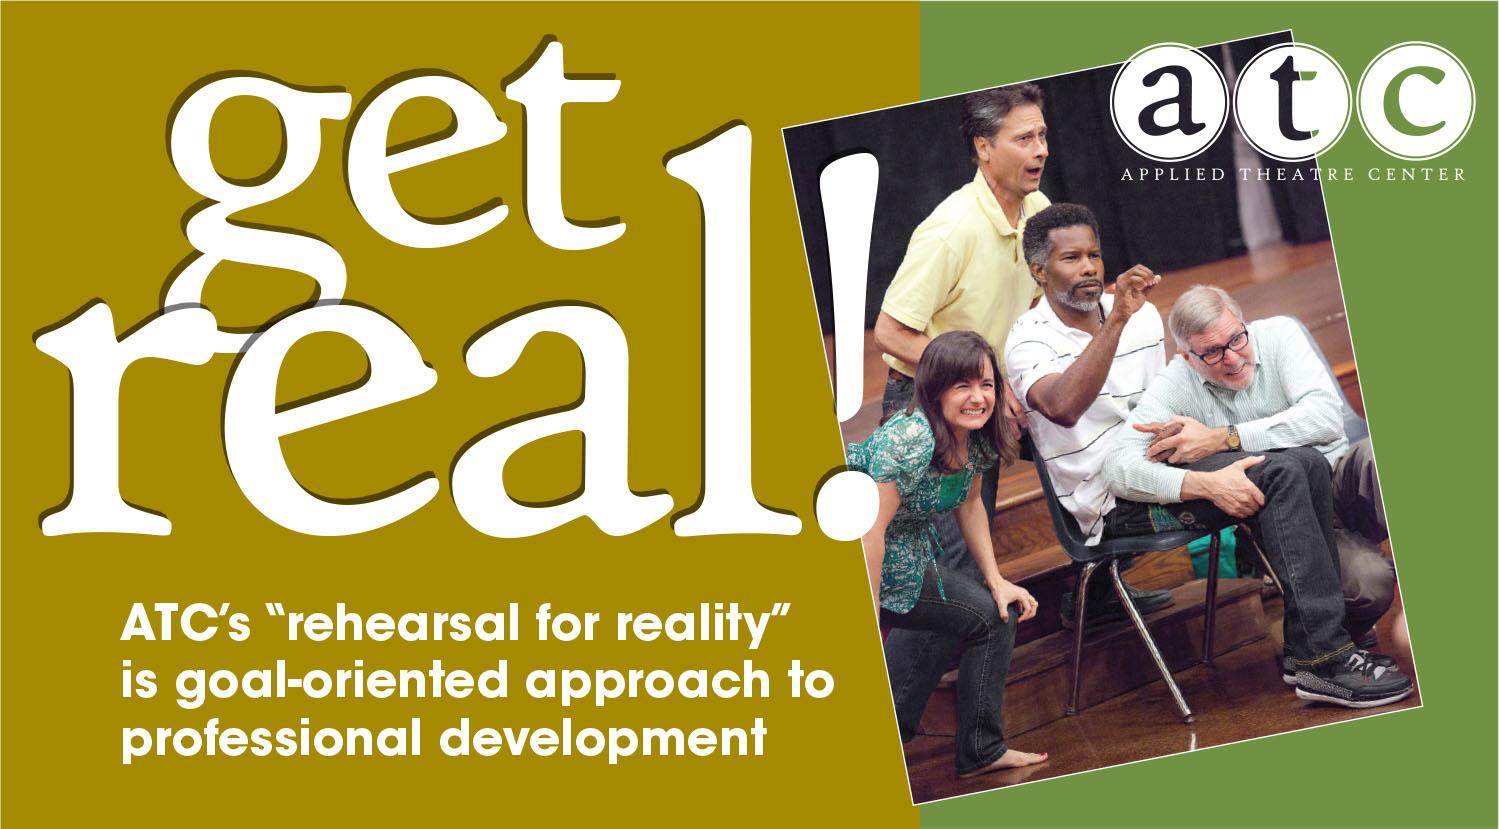 GET REAL! PROFESSIONAL DEVELOPMENT